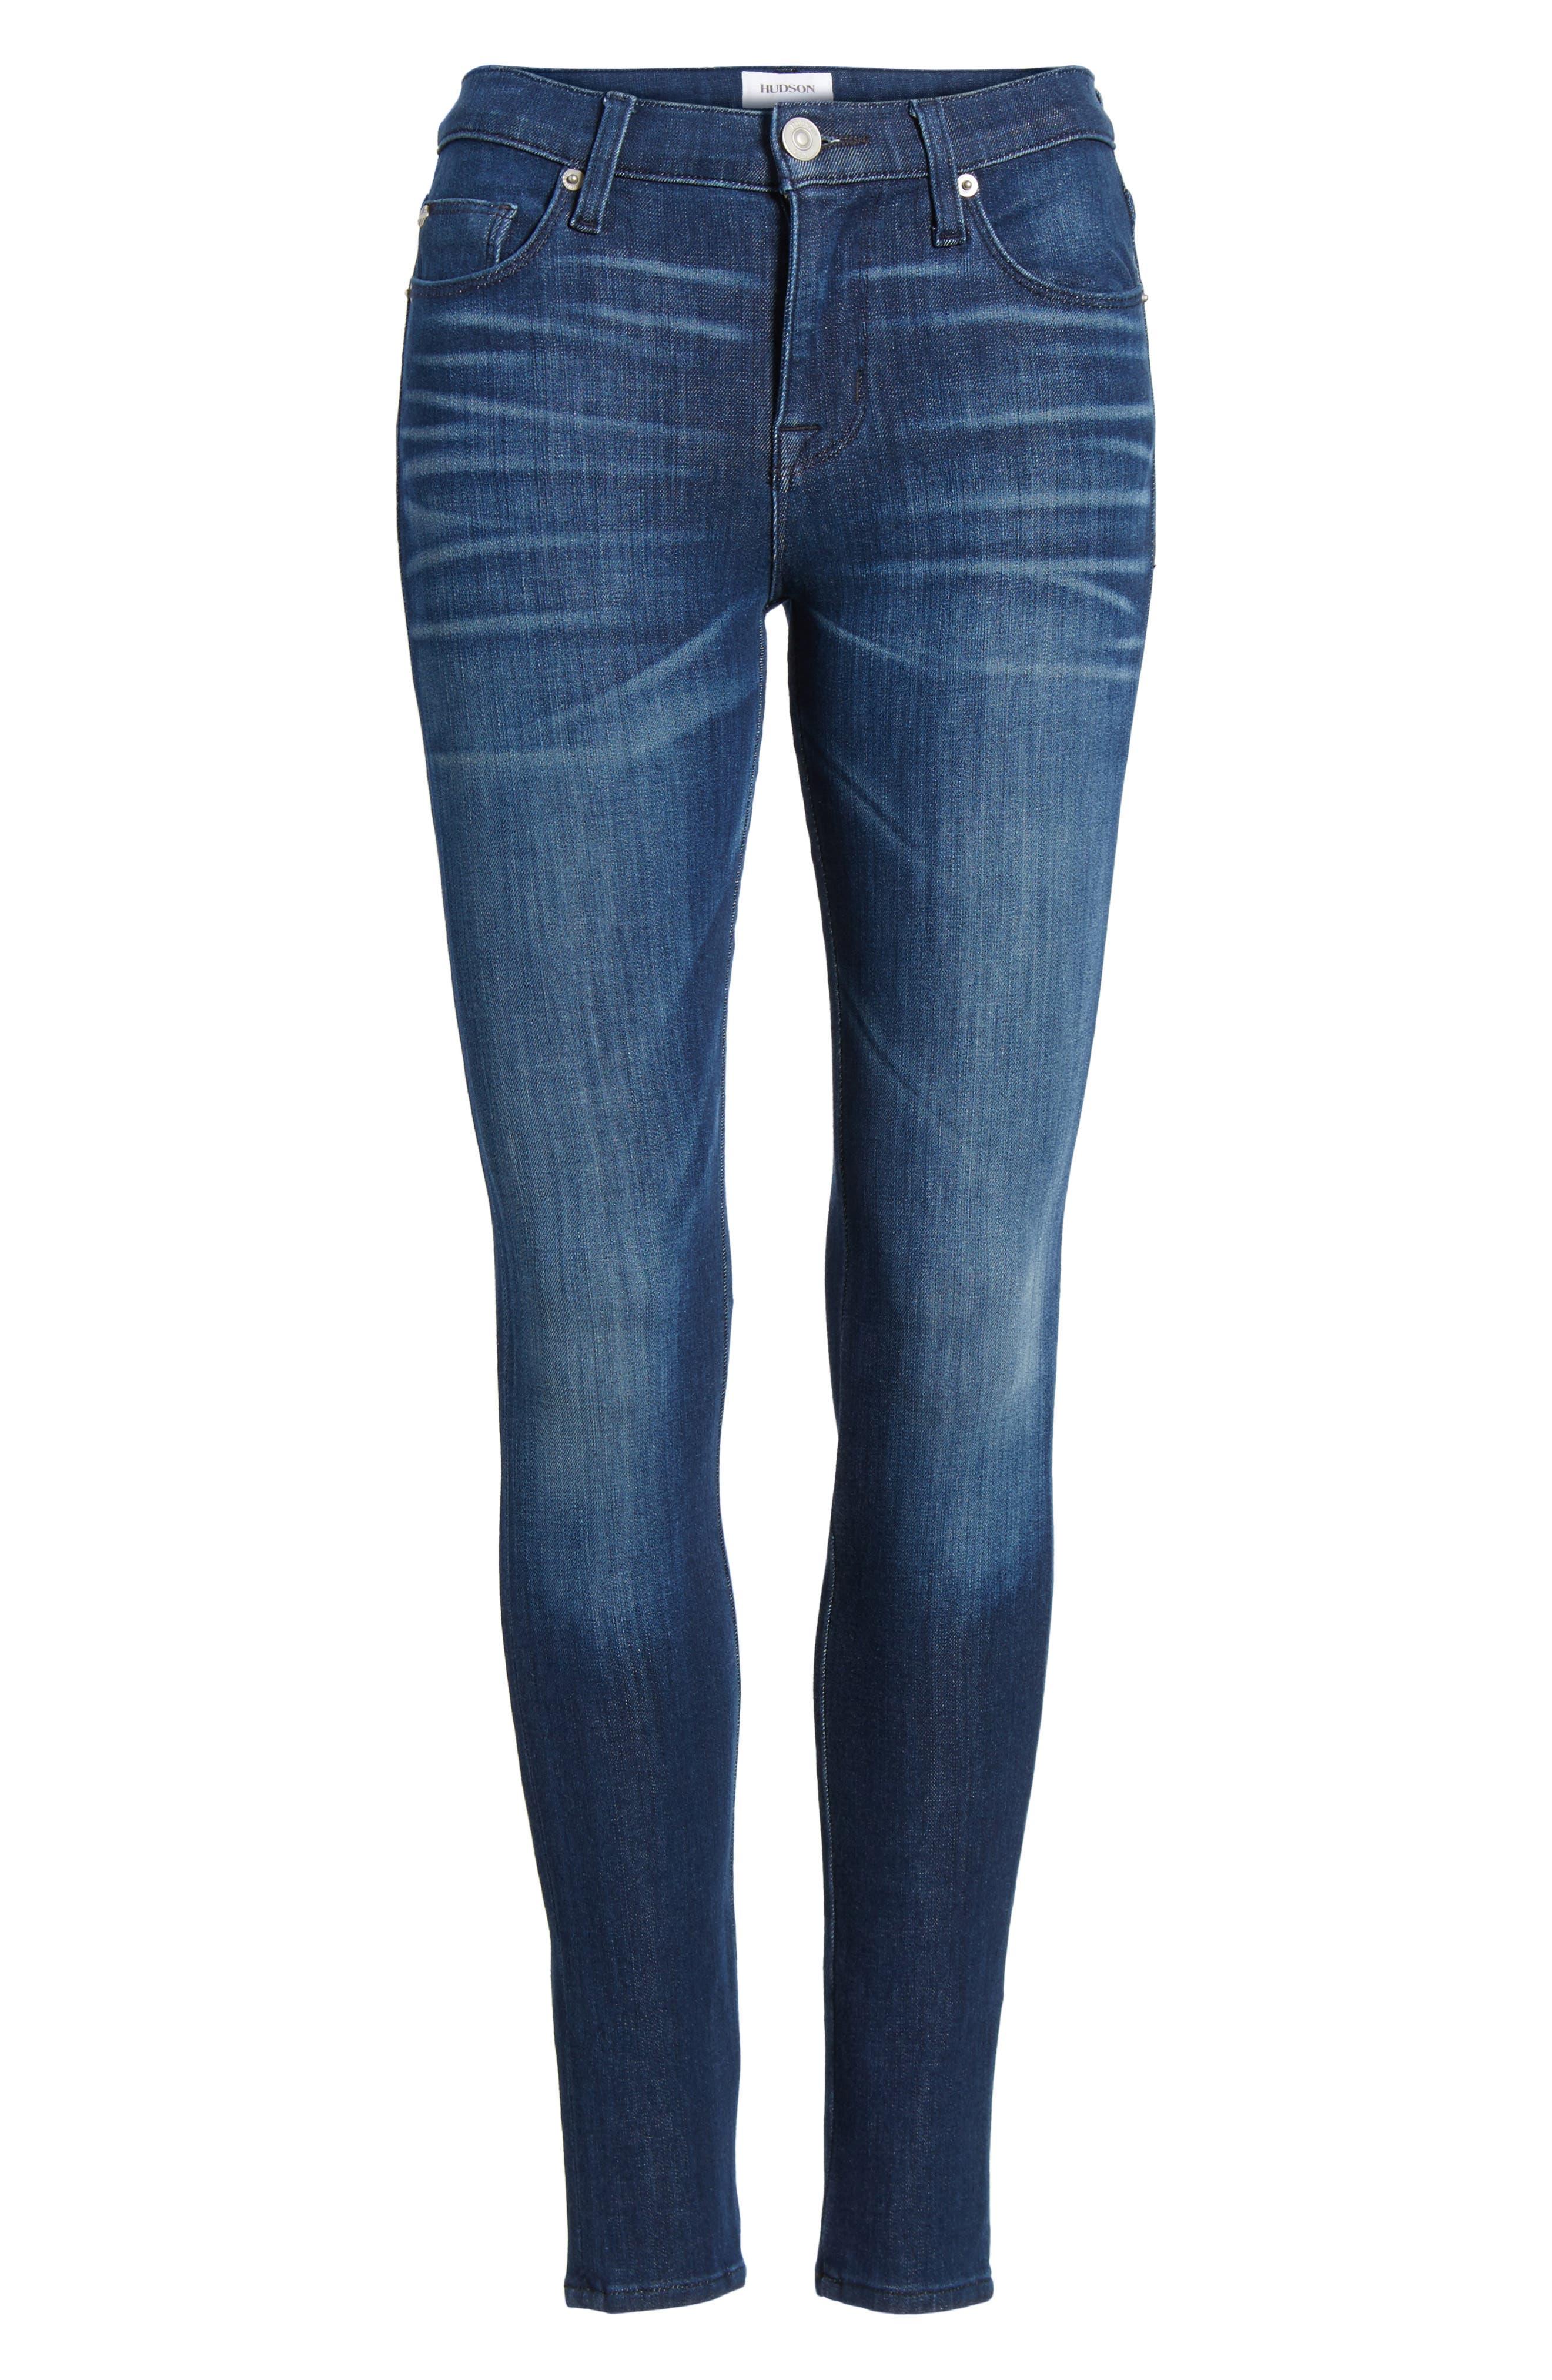 Nico Super Skinny Jeans,                             Alternate thumbnail 16, color,